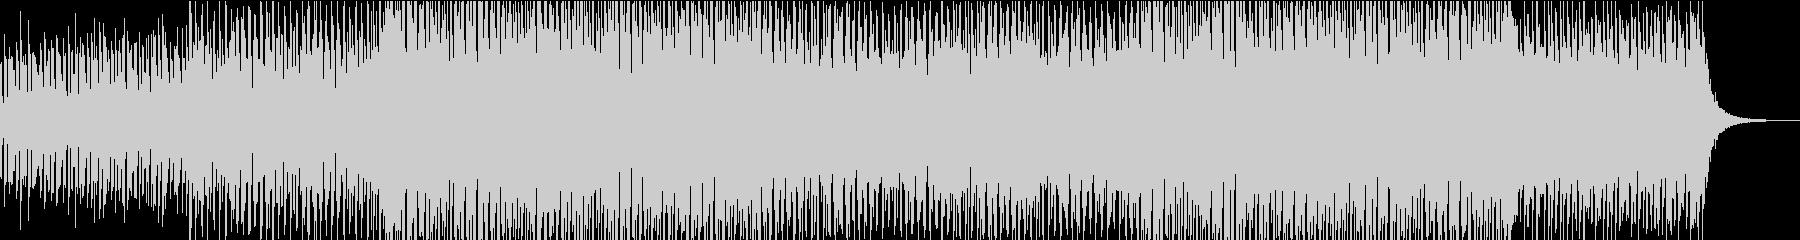 TV・ラジオのBGMを意識したエレクトロの未再生の波形